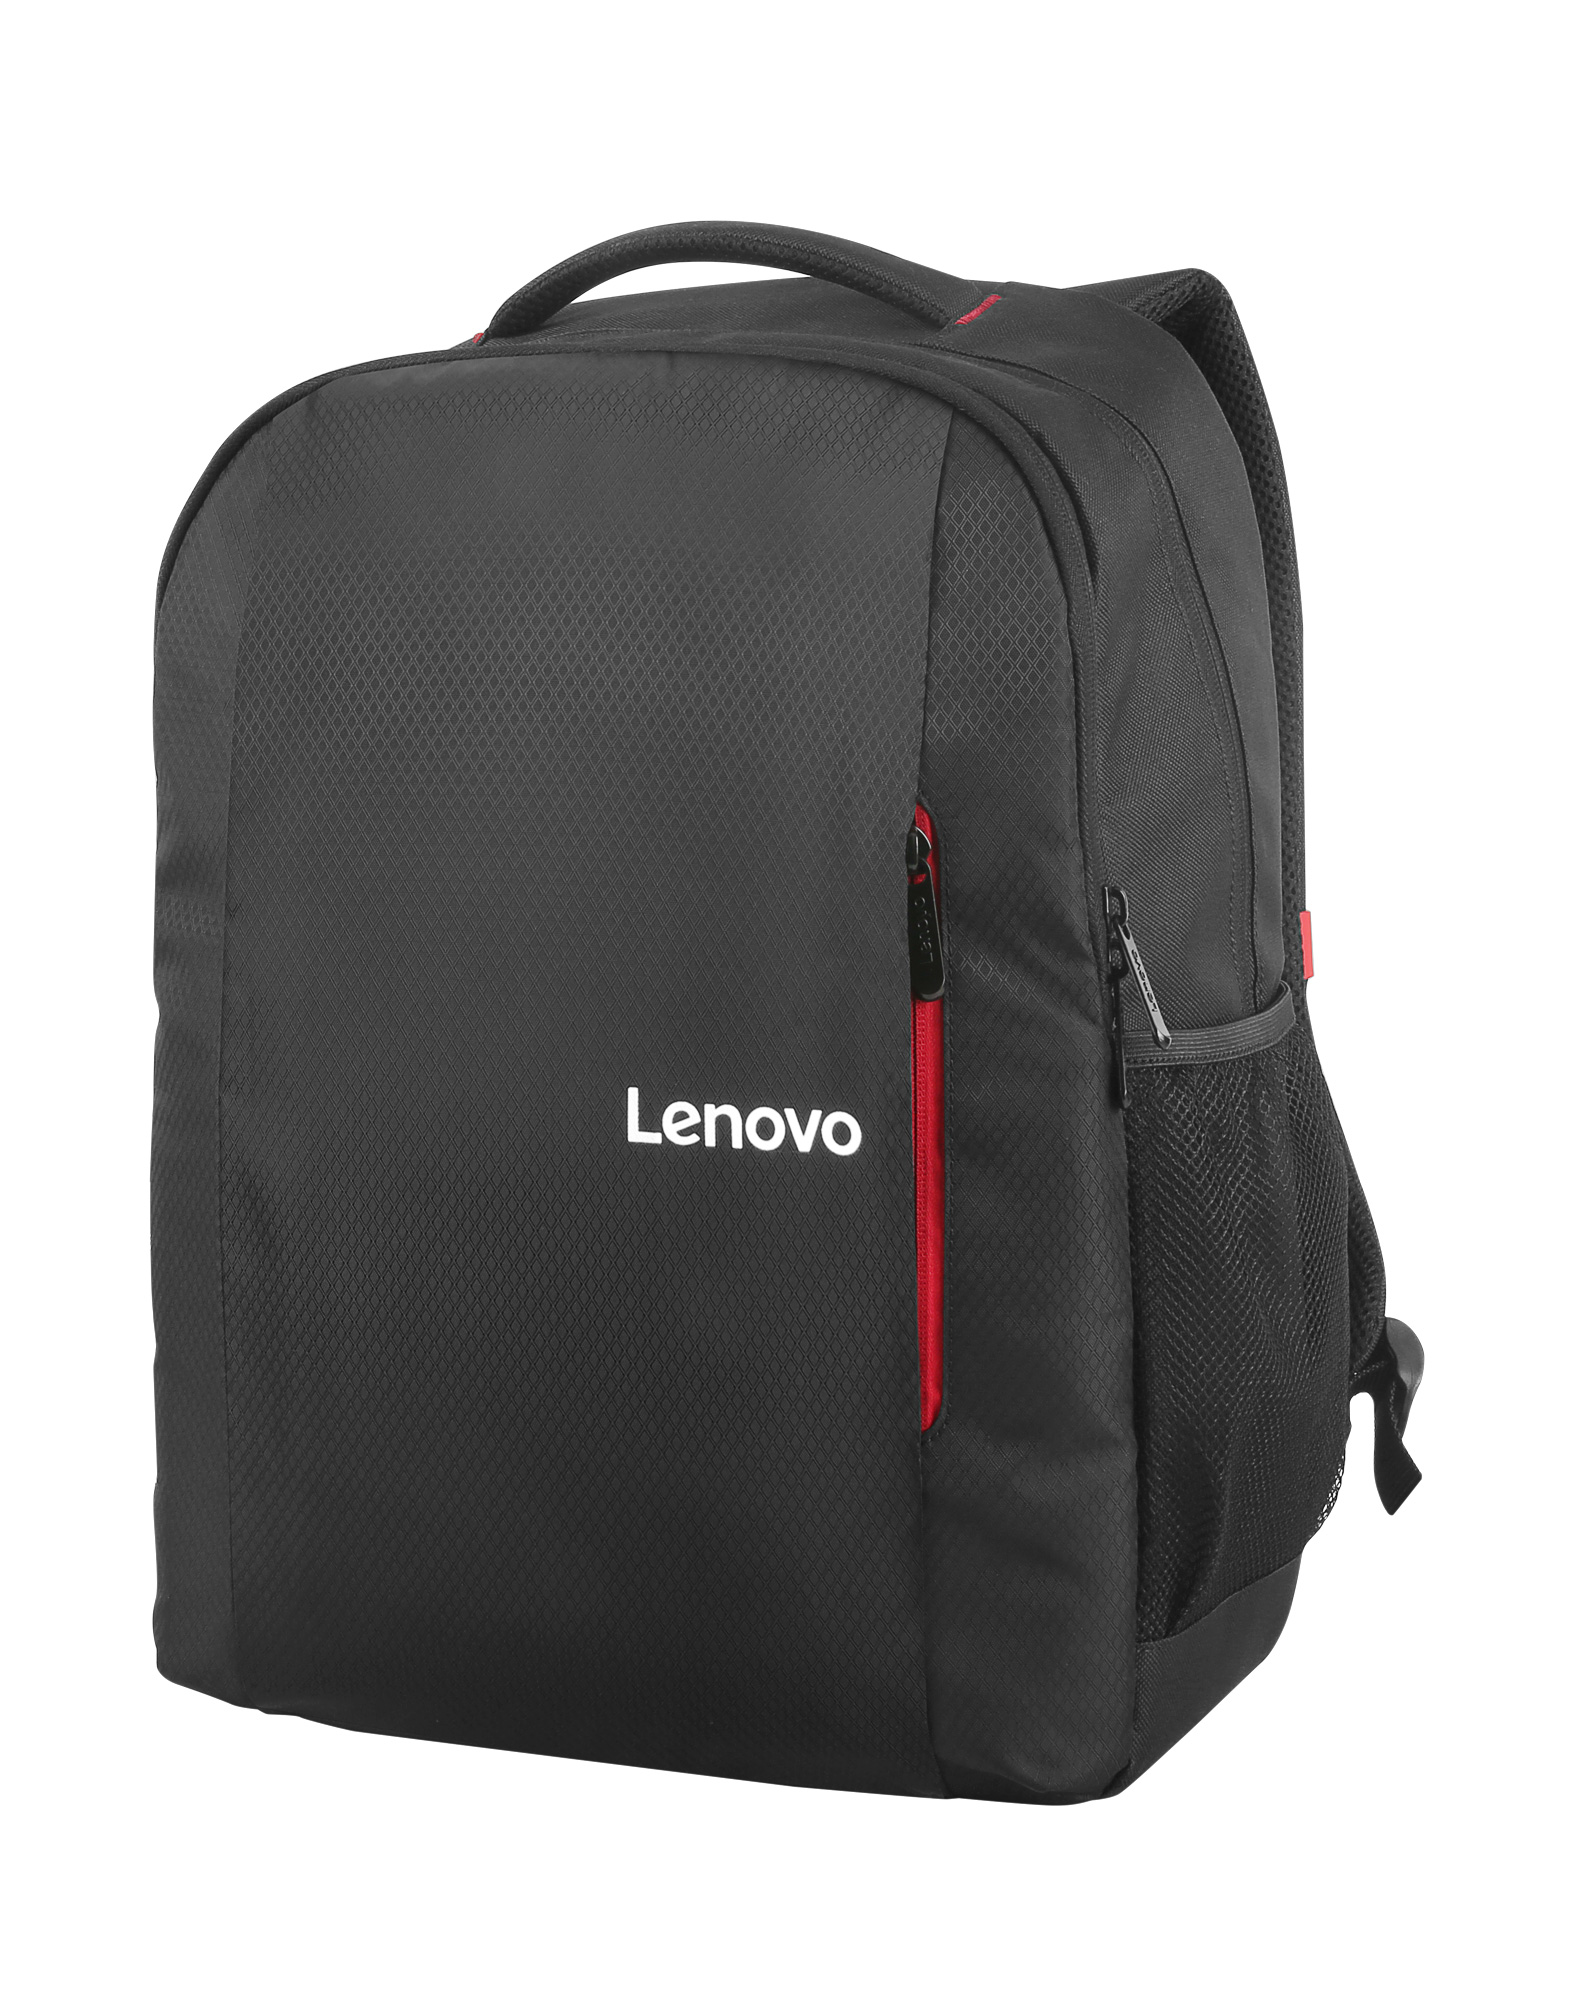 "Фото  Рюкзак Lenovo 15.6"" Laptop Everyday Backpack B515 Black (GX40Q75215)"